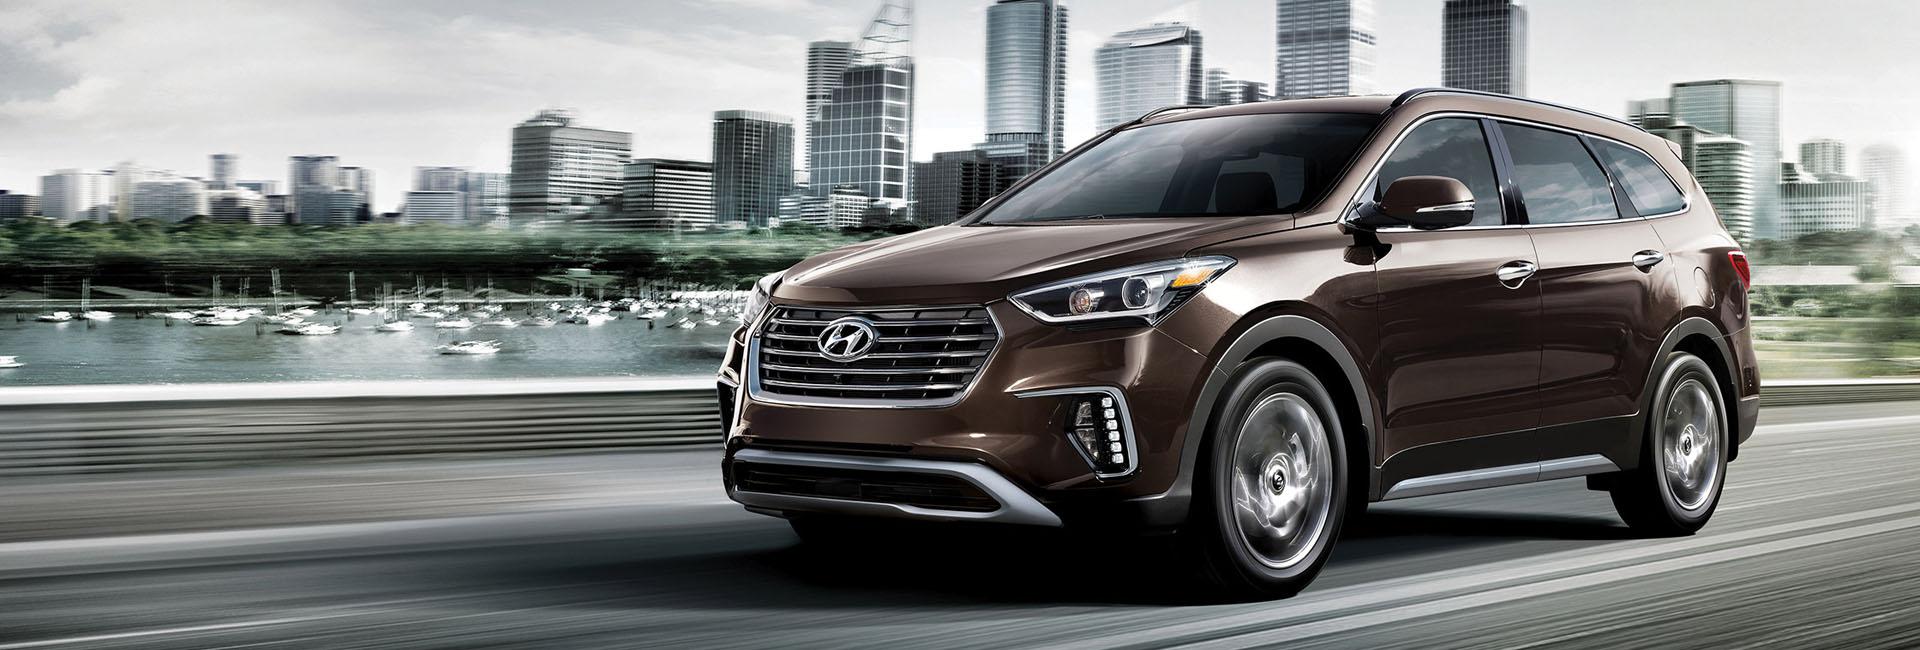 2017 Hyundai Santa Fe XL Pathway Hyundai Ottawa ON